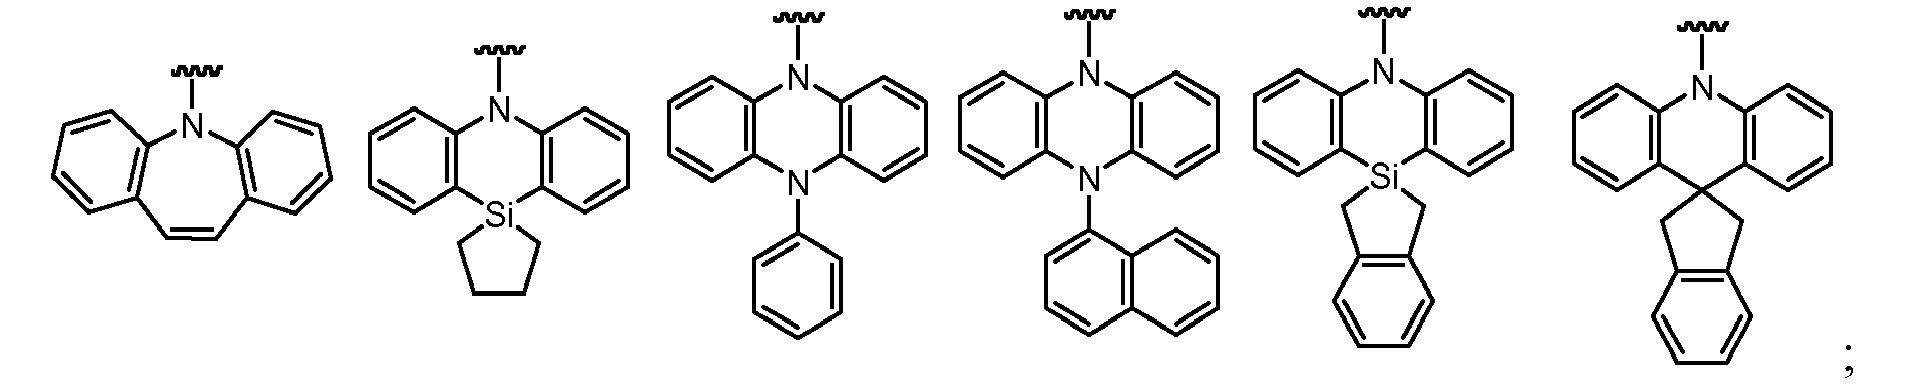 Figure imgb0405